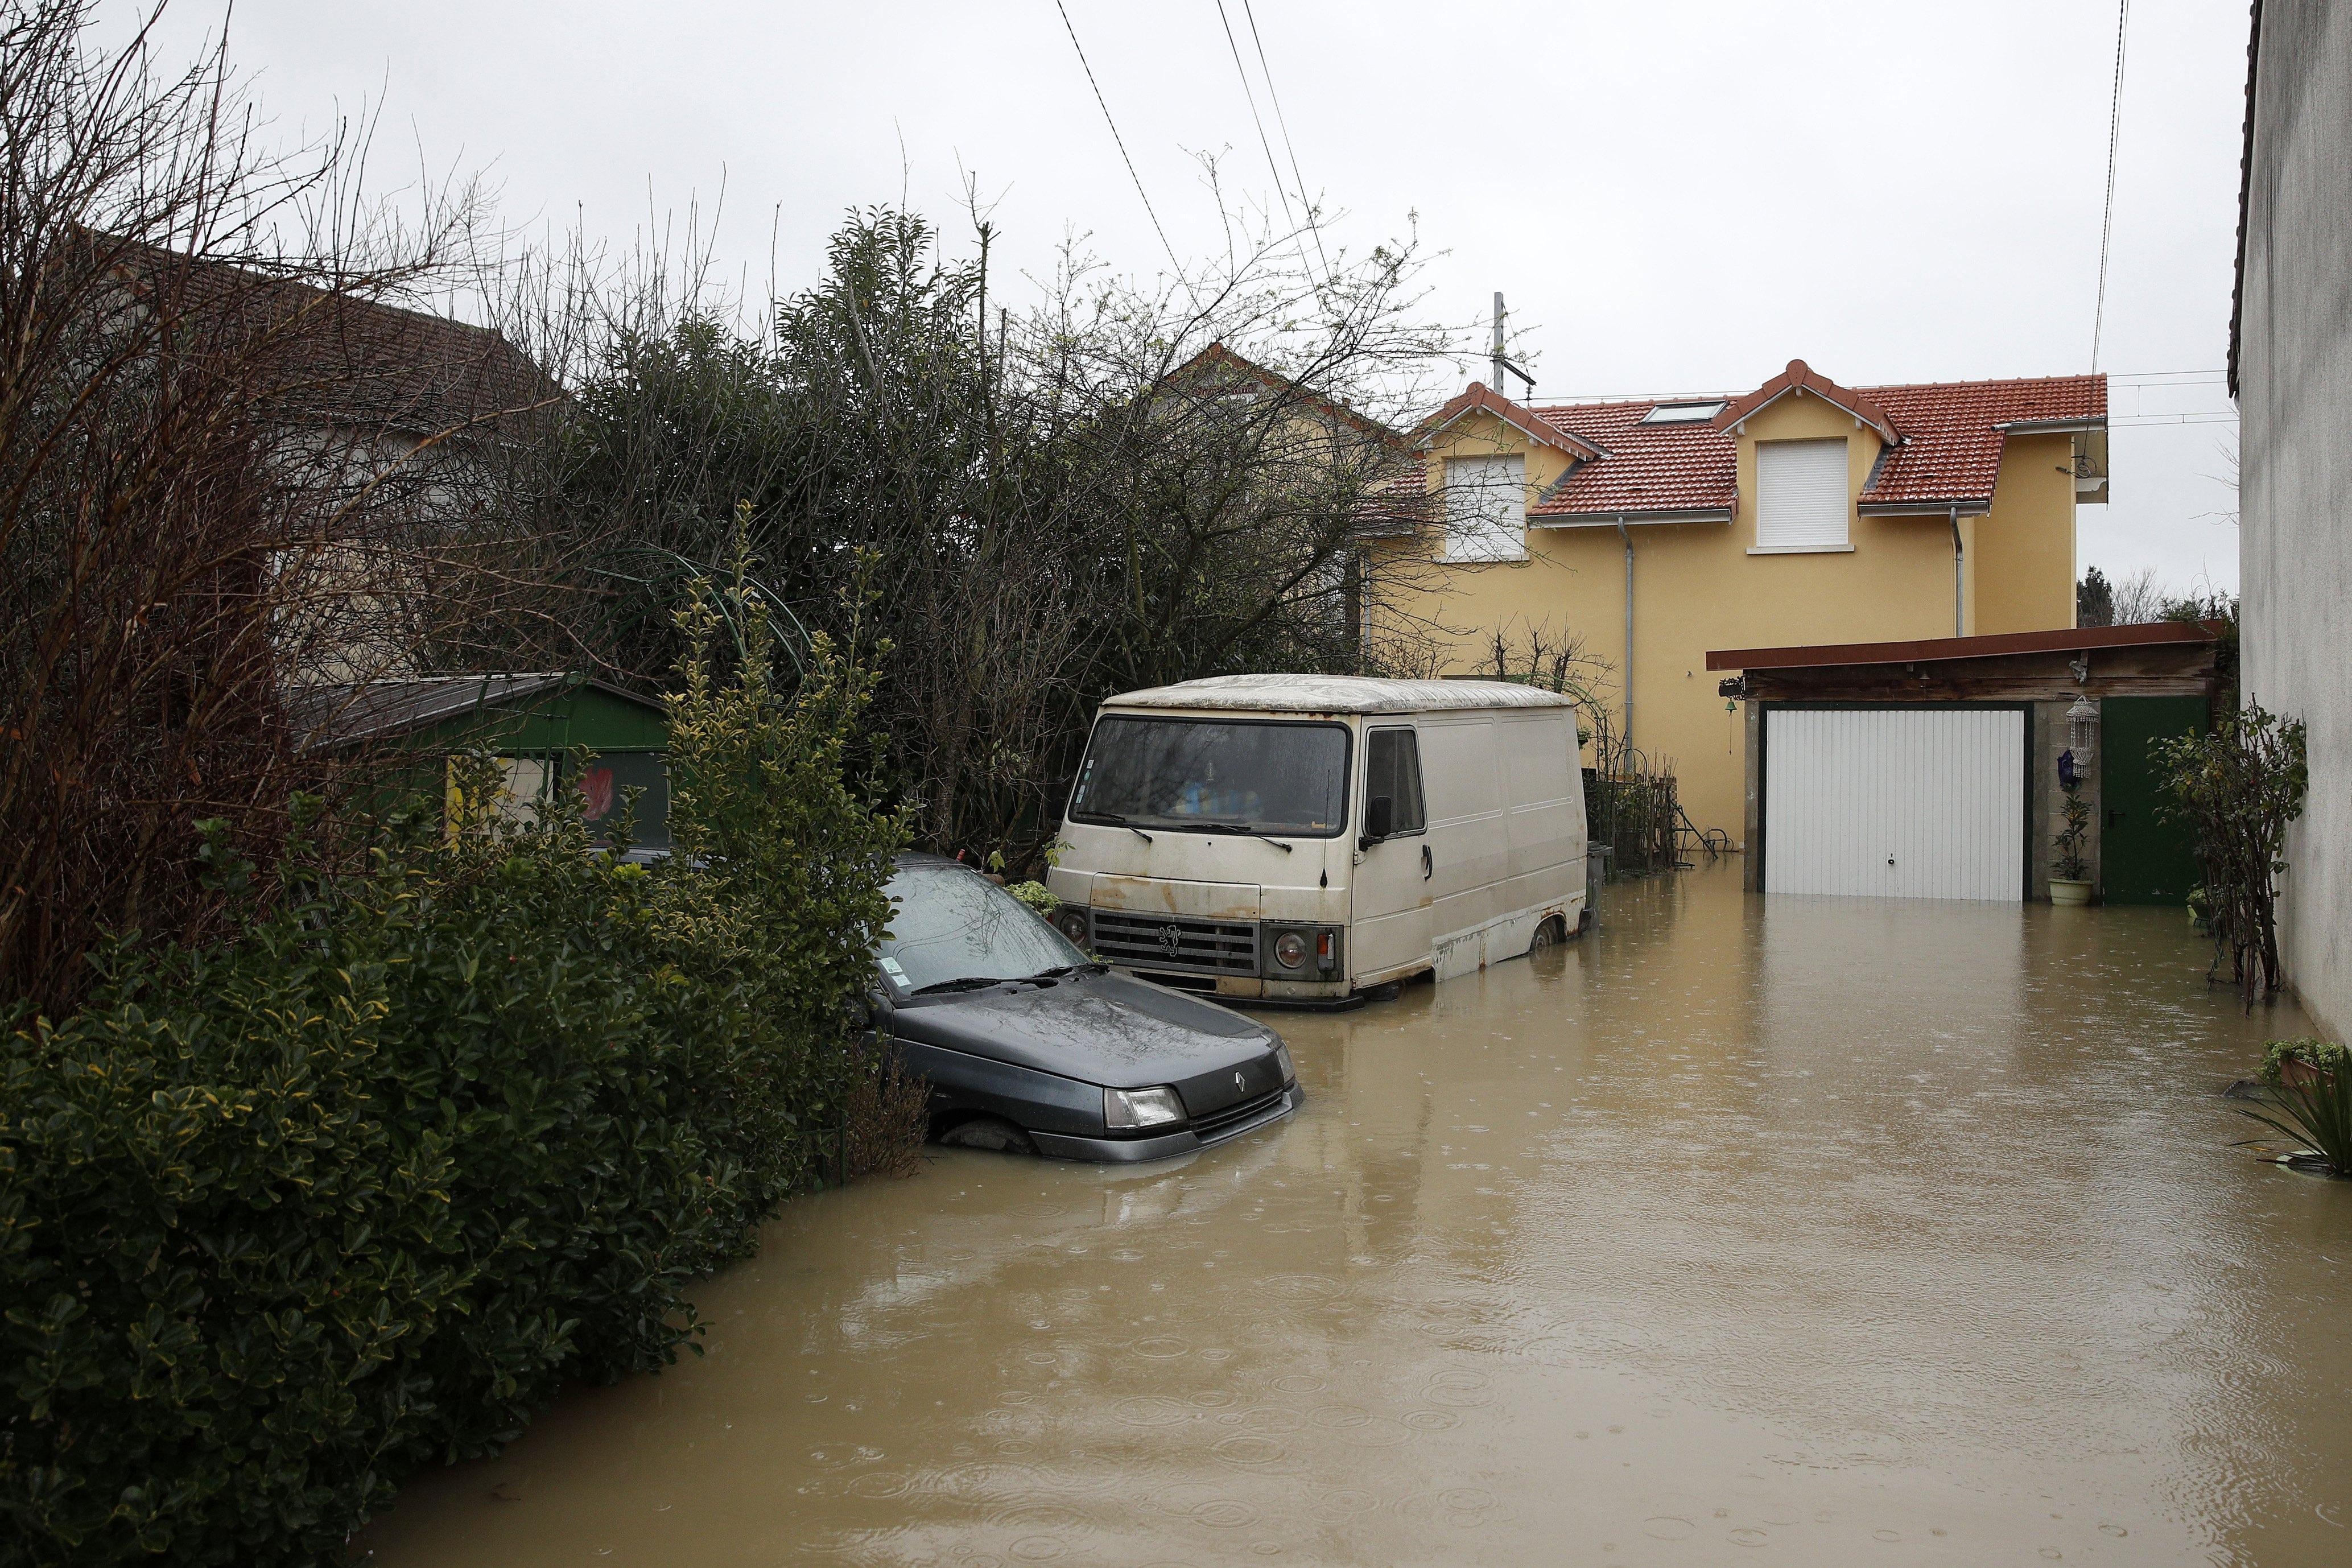 Major flood in the Ile-de-France region